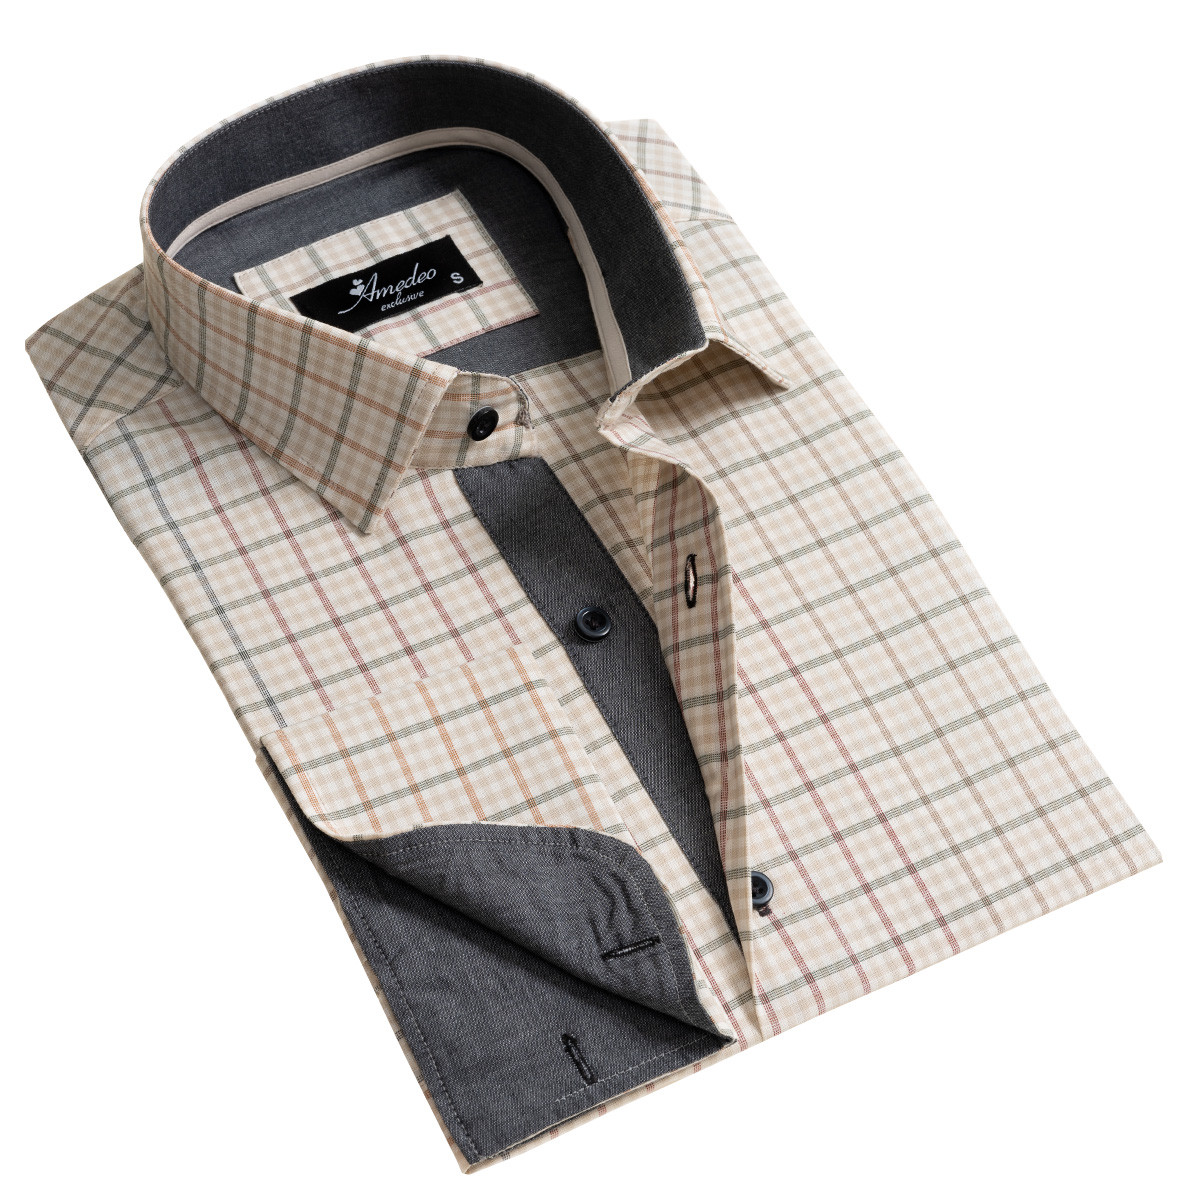 European Made & Designed Reversible Cuff Premium French Cuff Dress Shirt - beige